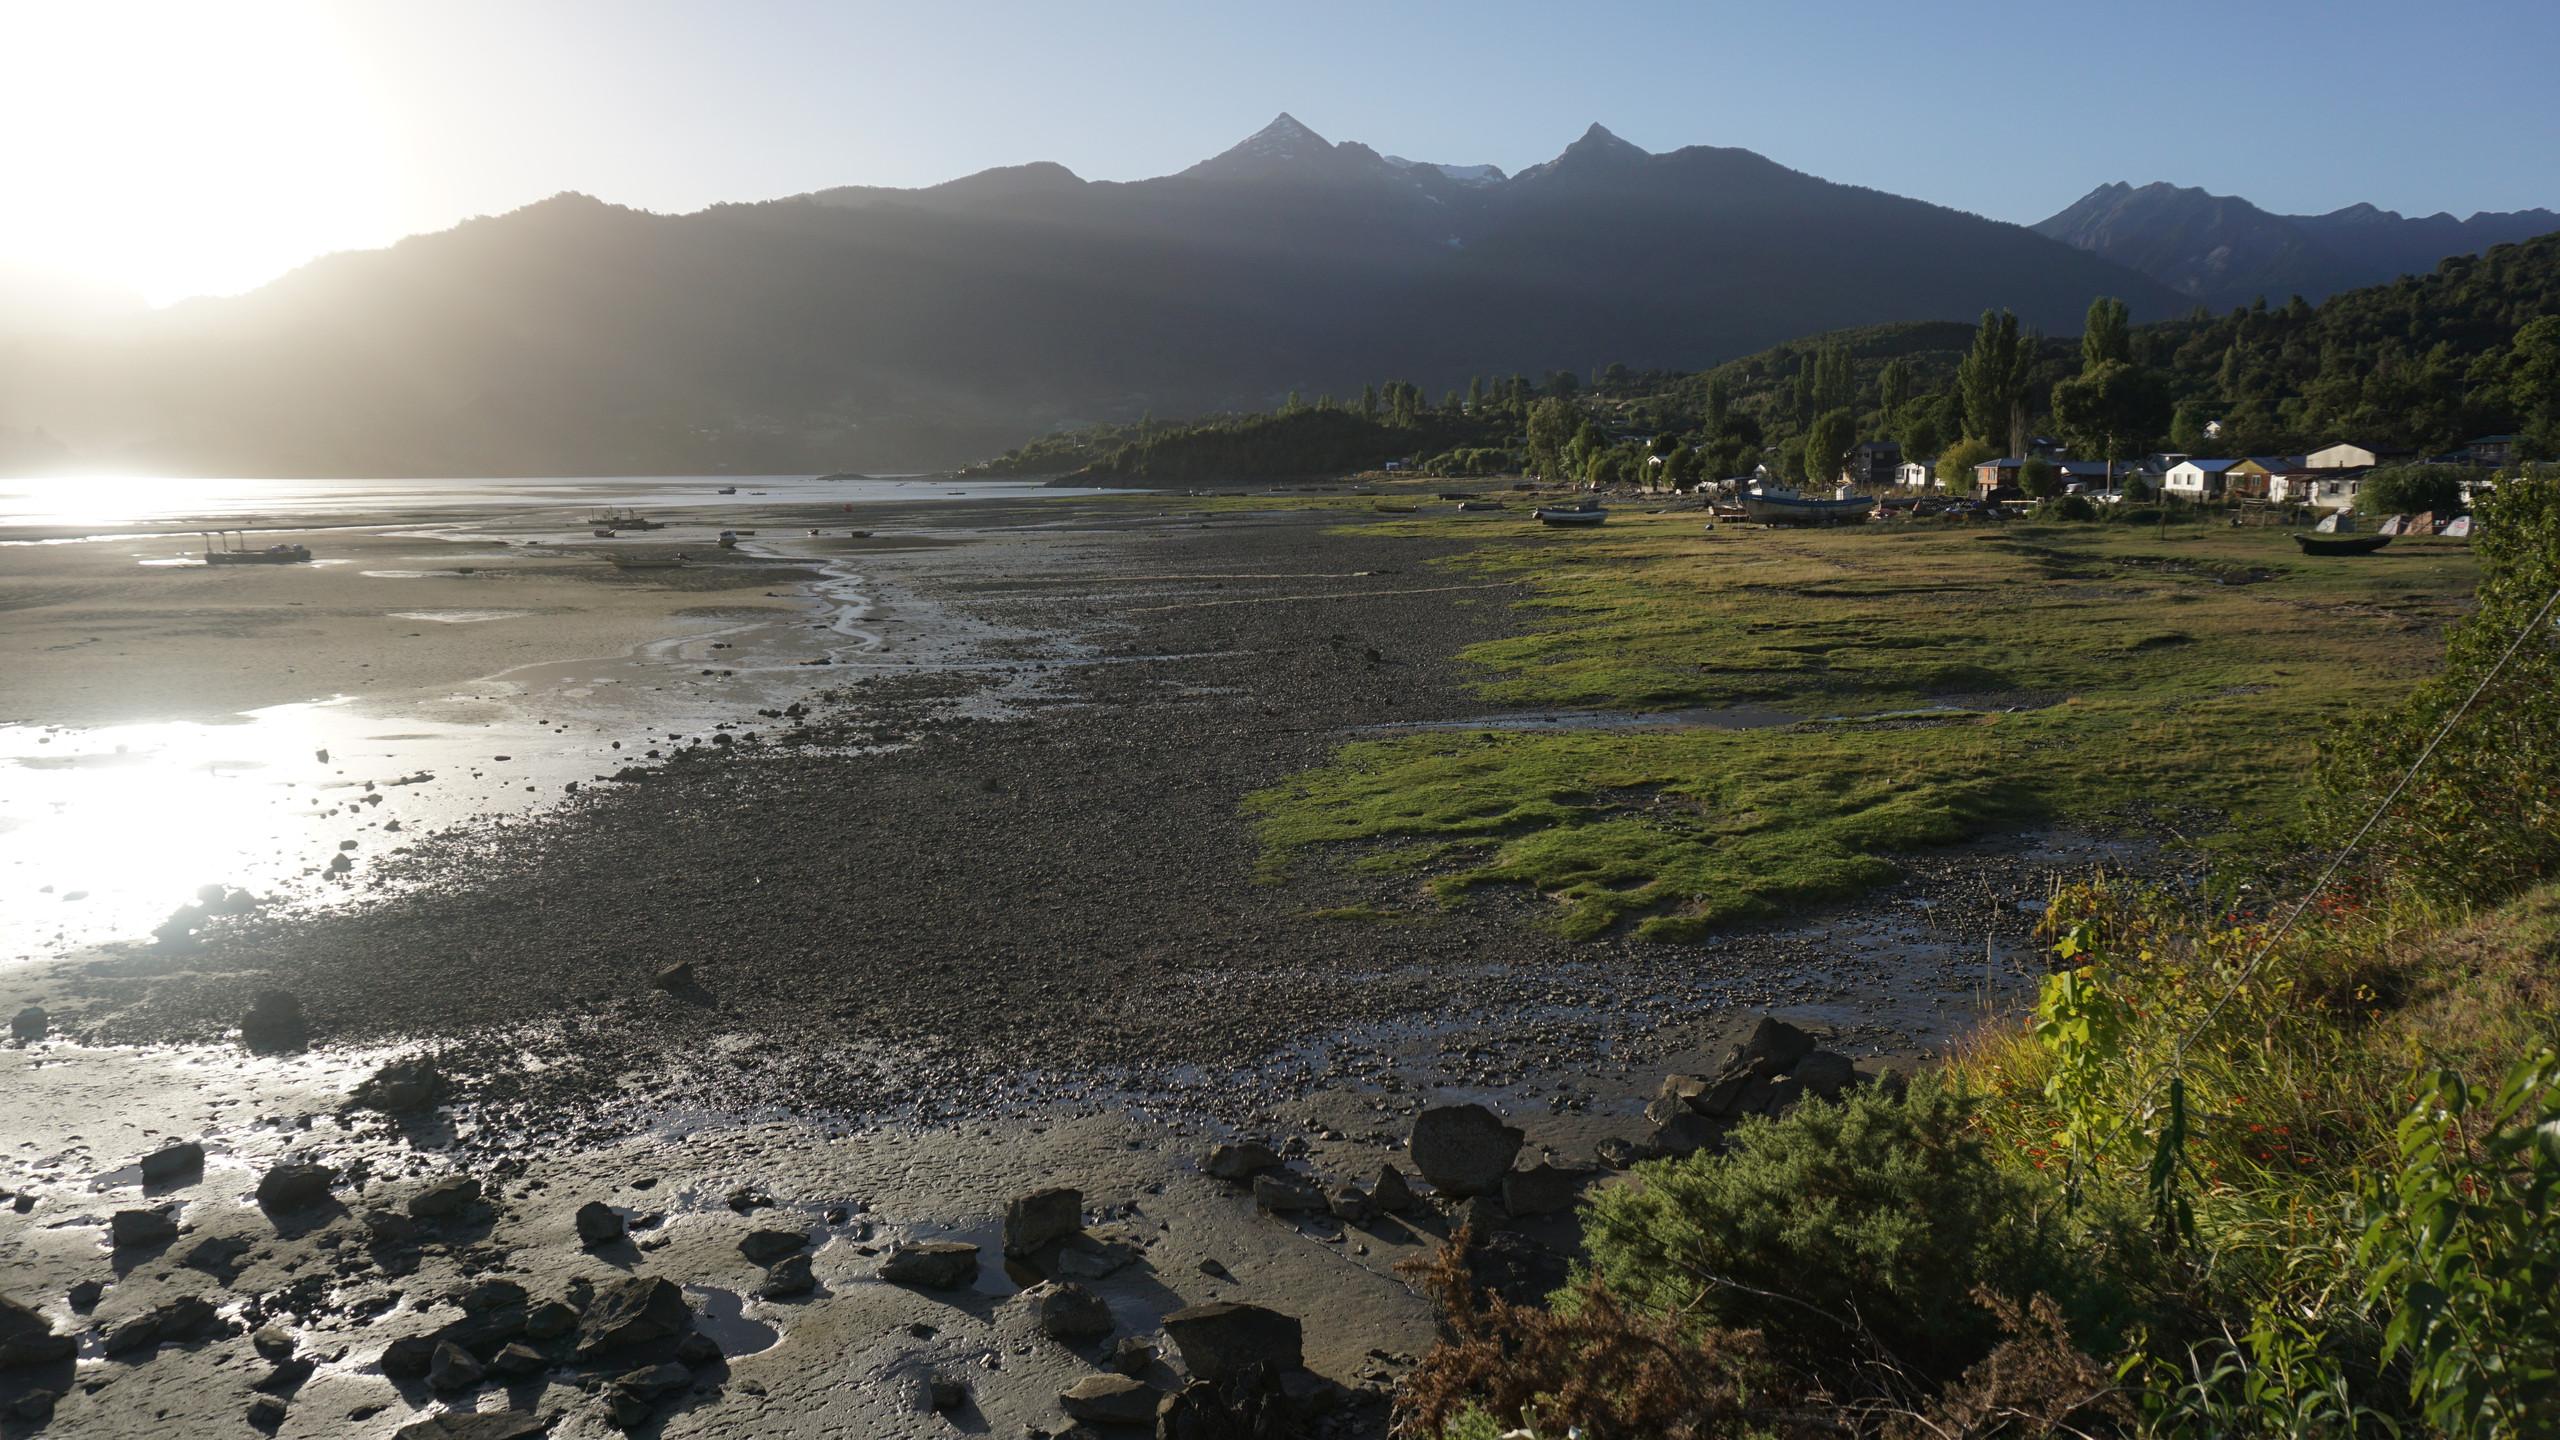 The fishing village of Cochamo